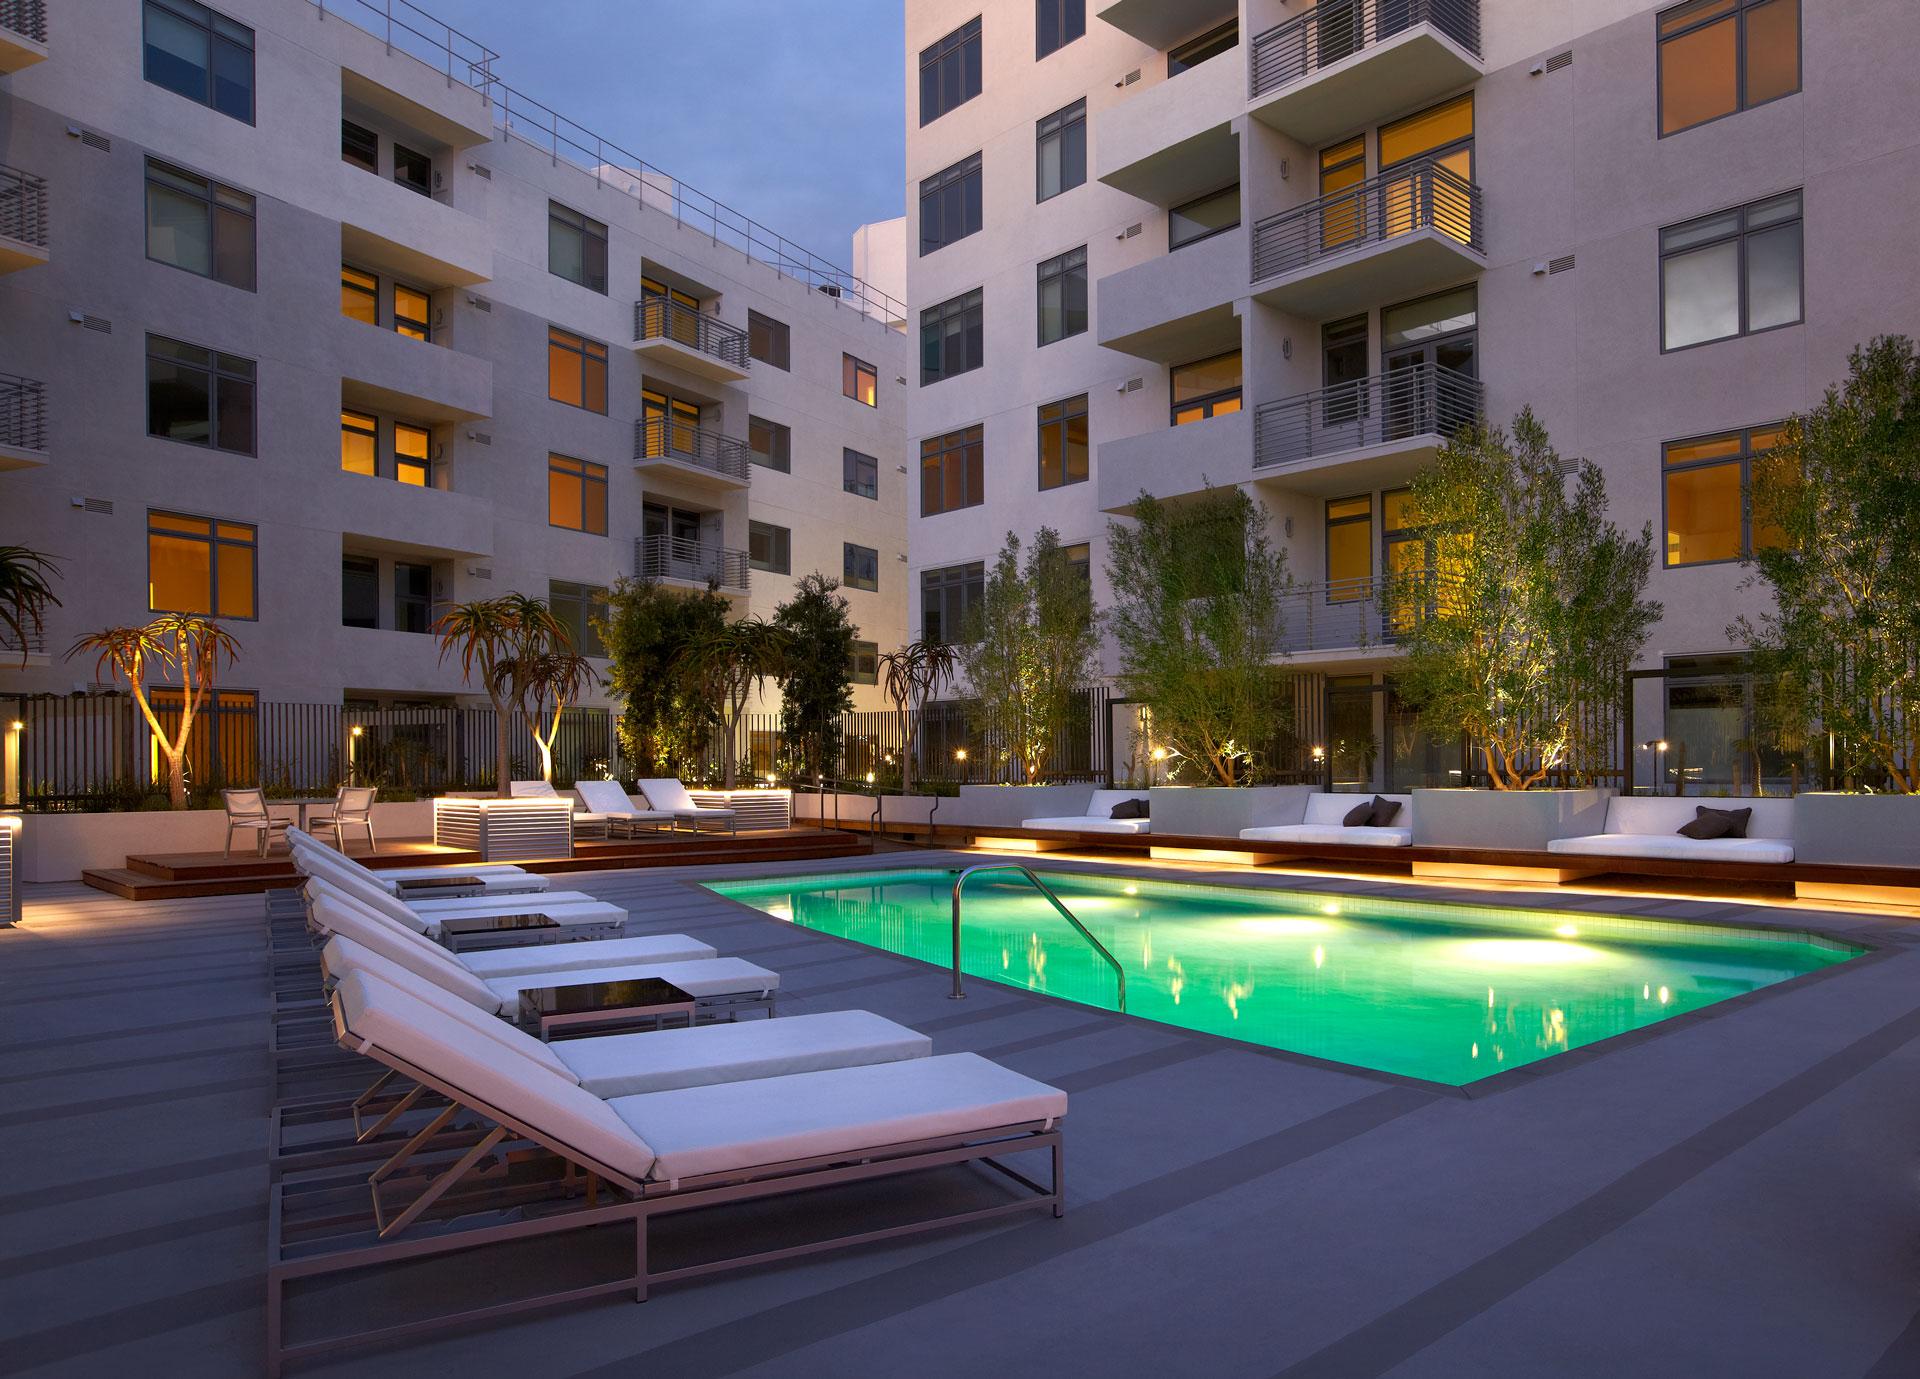 The Avenue courtyard pool